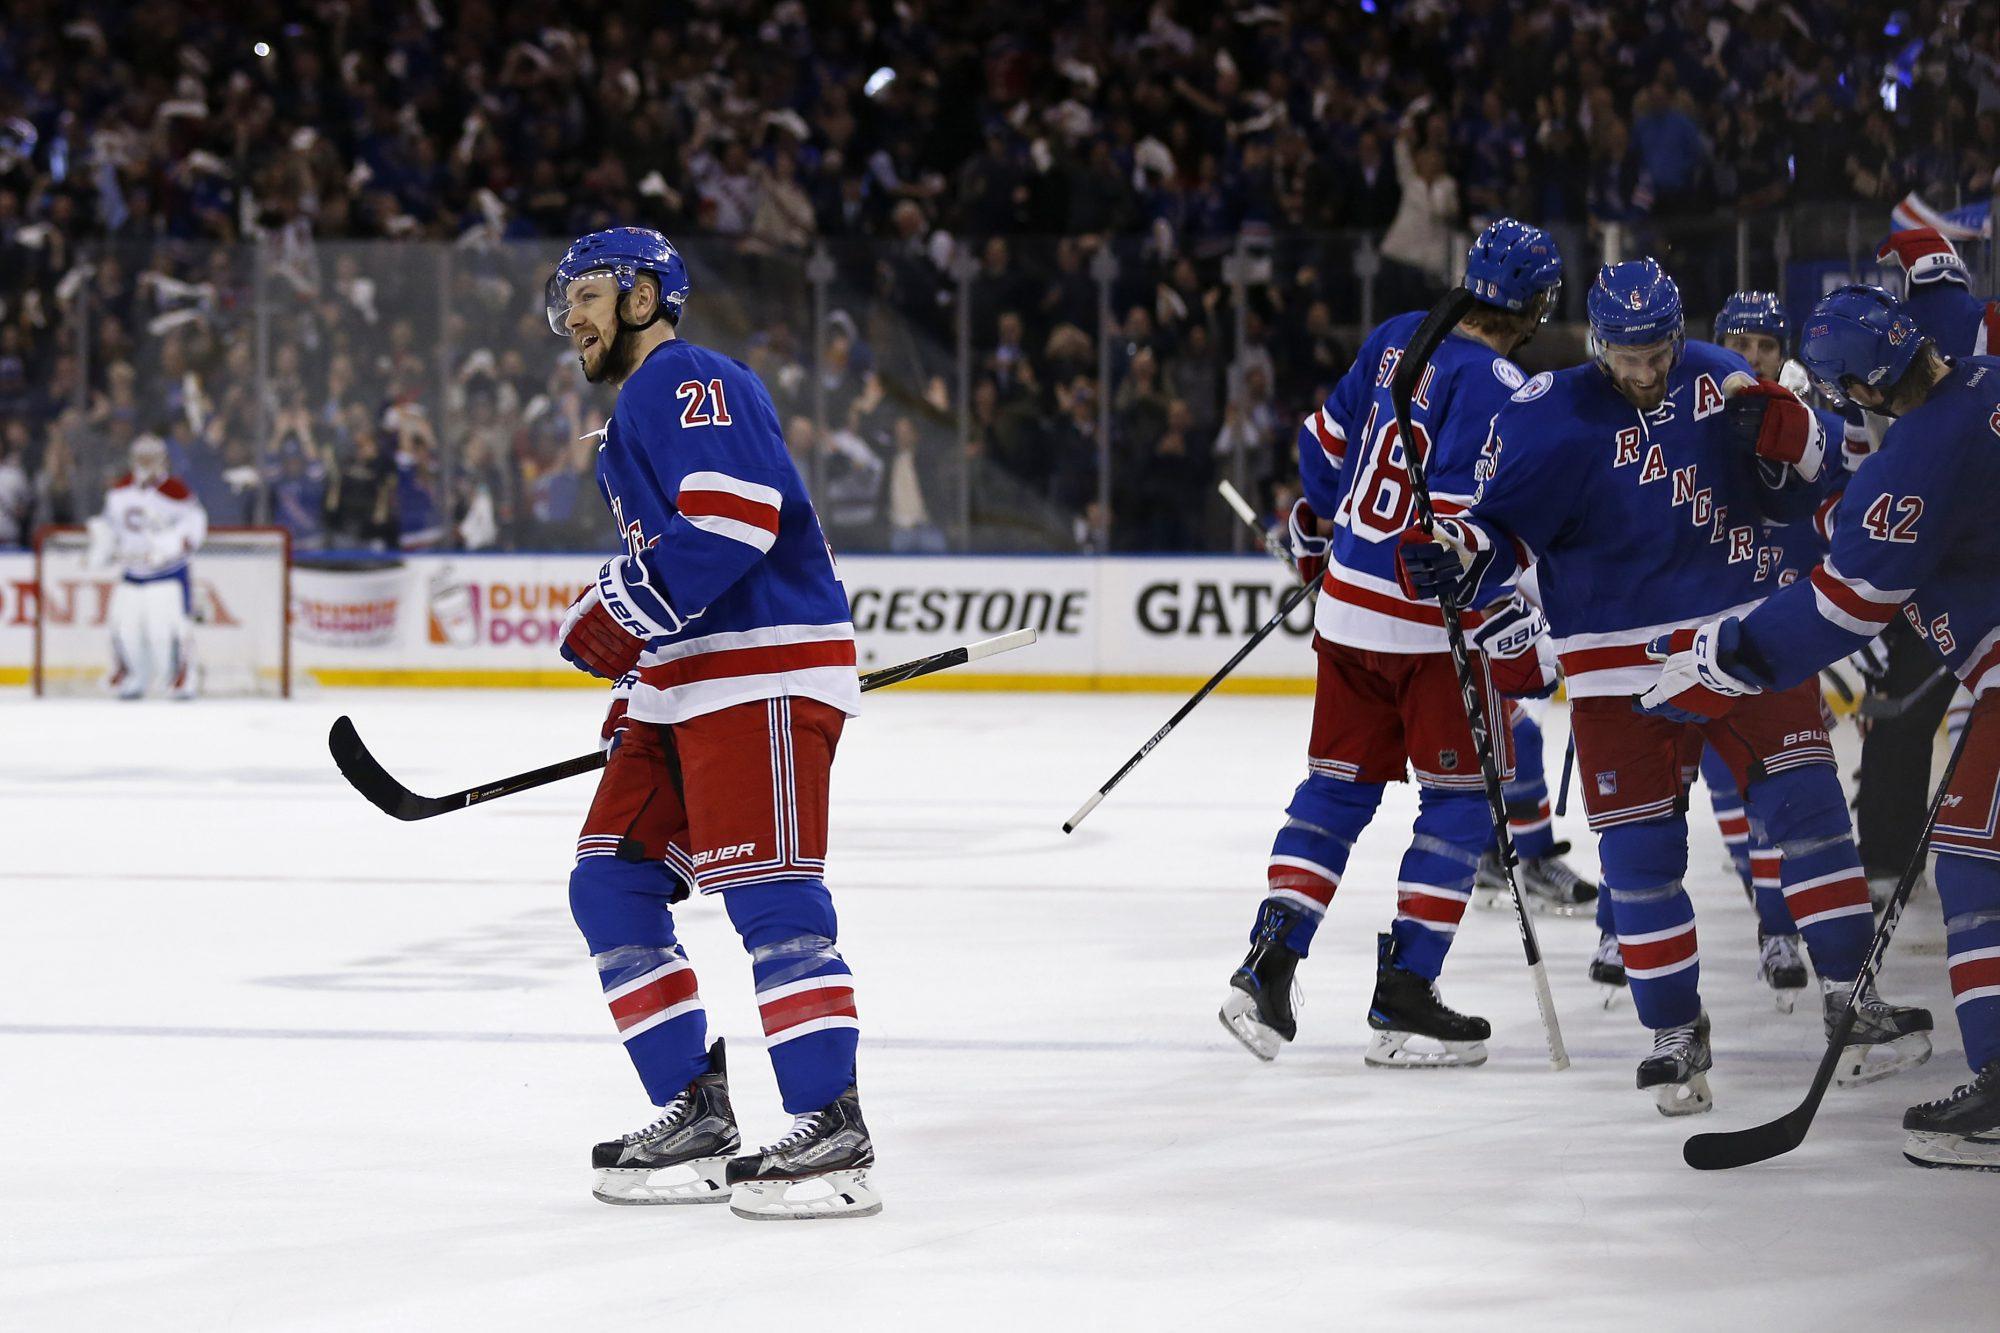 New York Rangers Leaving Derek Stepan Unprotected in Expansion Draft Still the Better Move